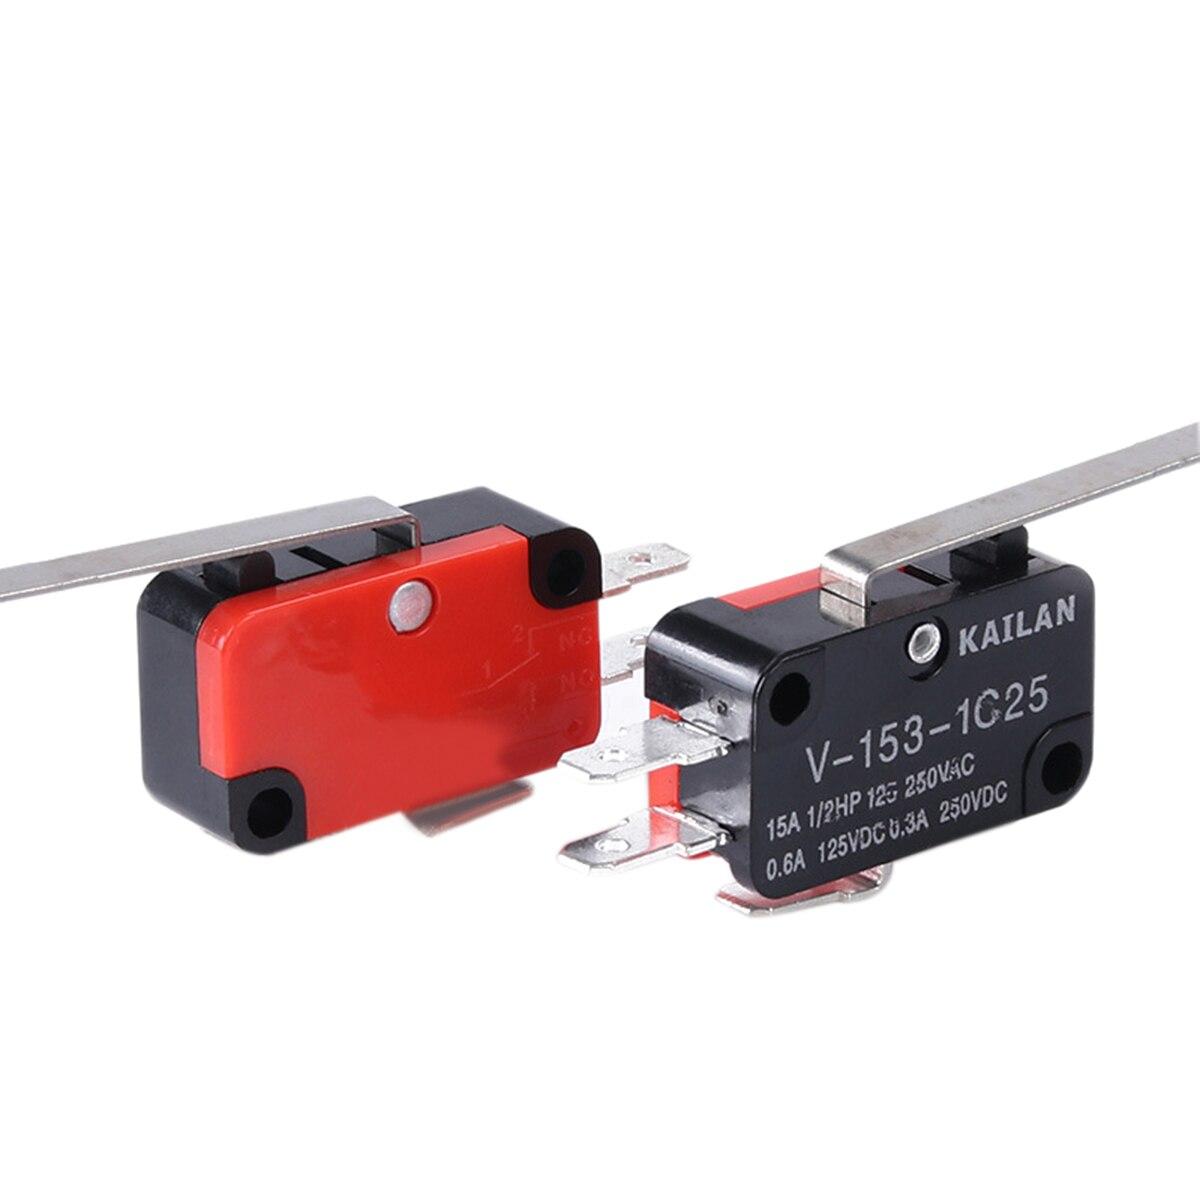 2X 10 Pcs AC 125V 1A SPDT 1NO 1NC Momentary Long Hinge Lever Micro Switch S8U 2C